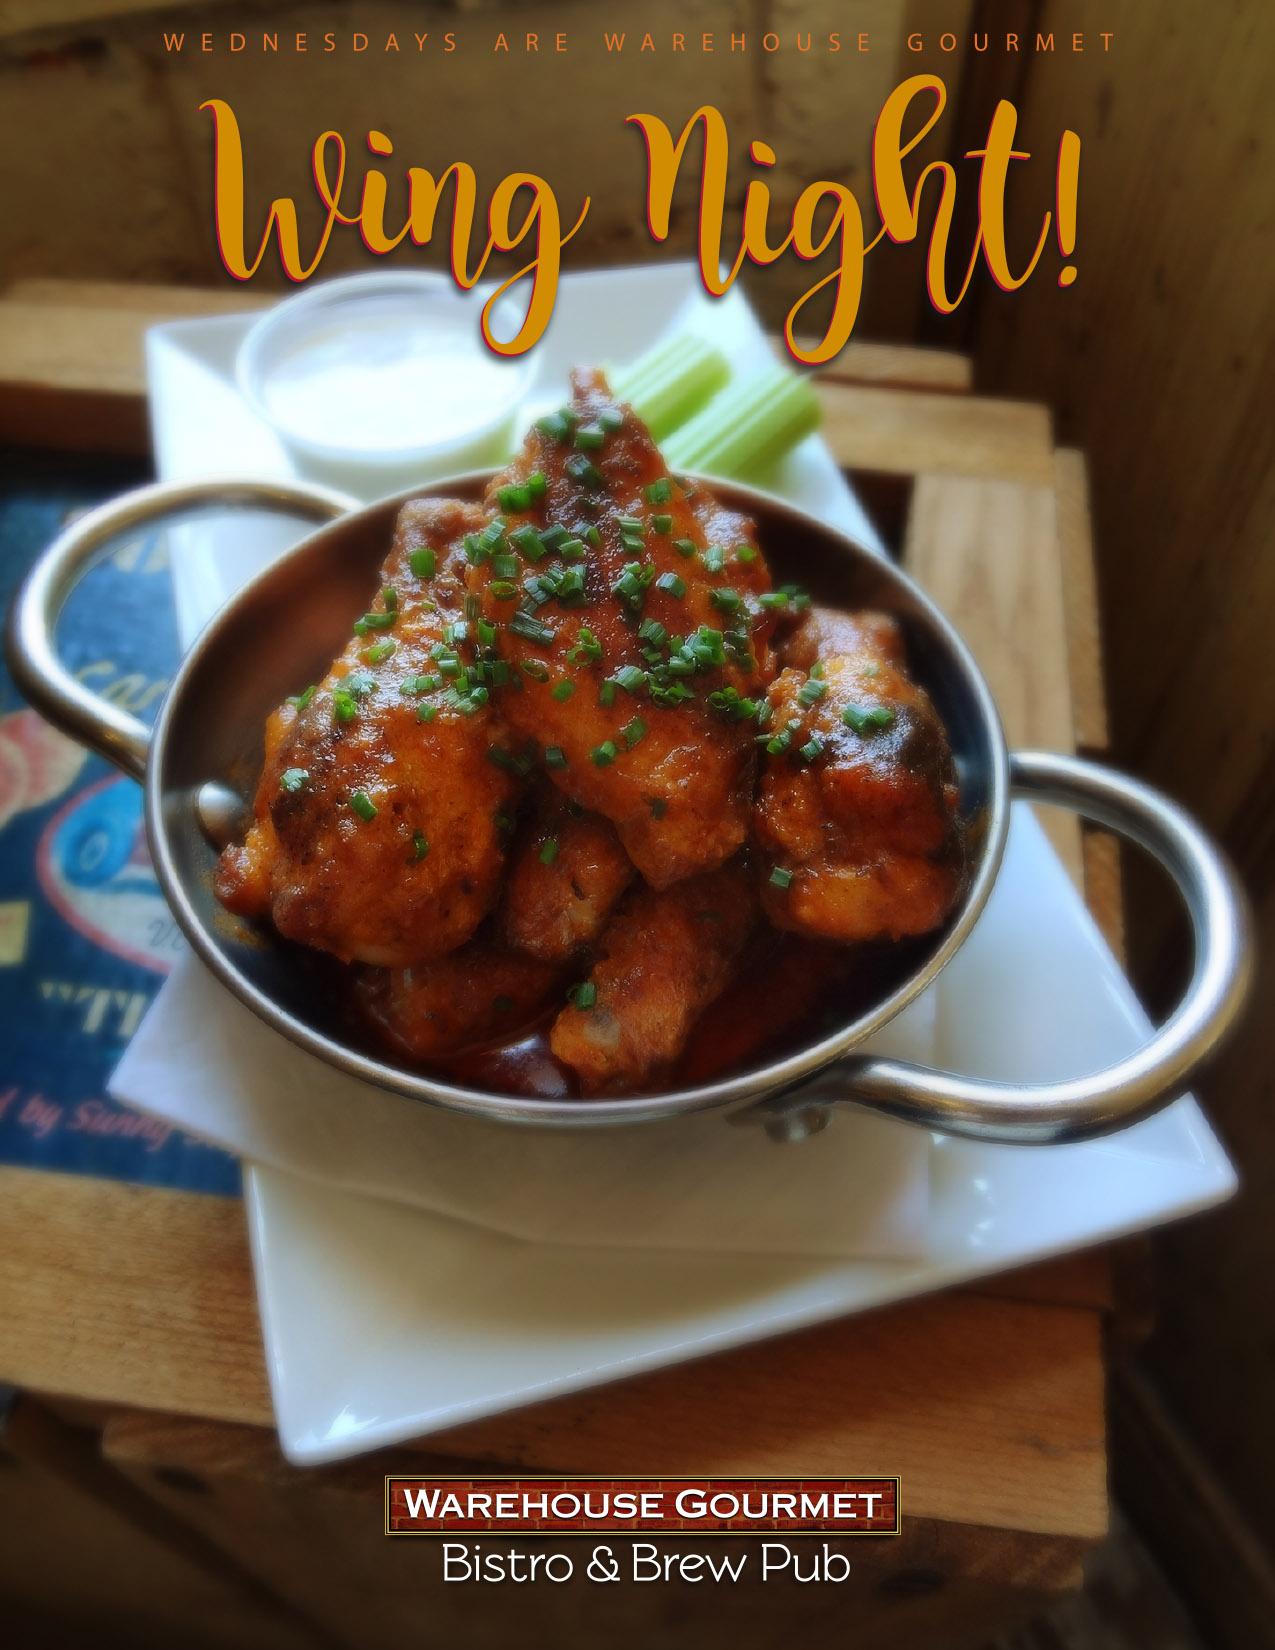 Wing Night Ad 180428.jpg